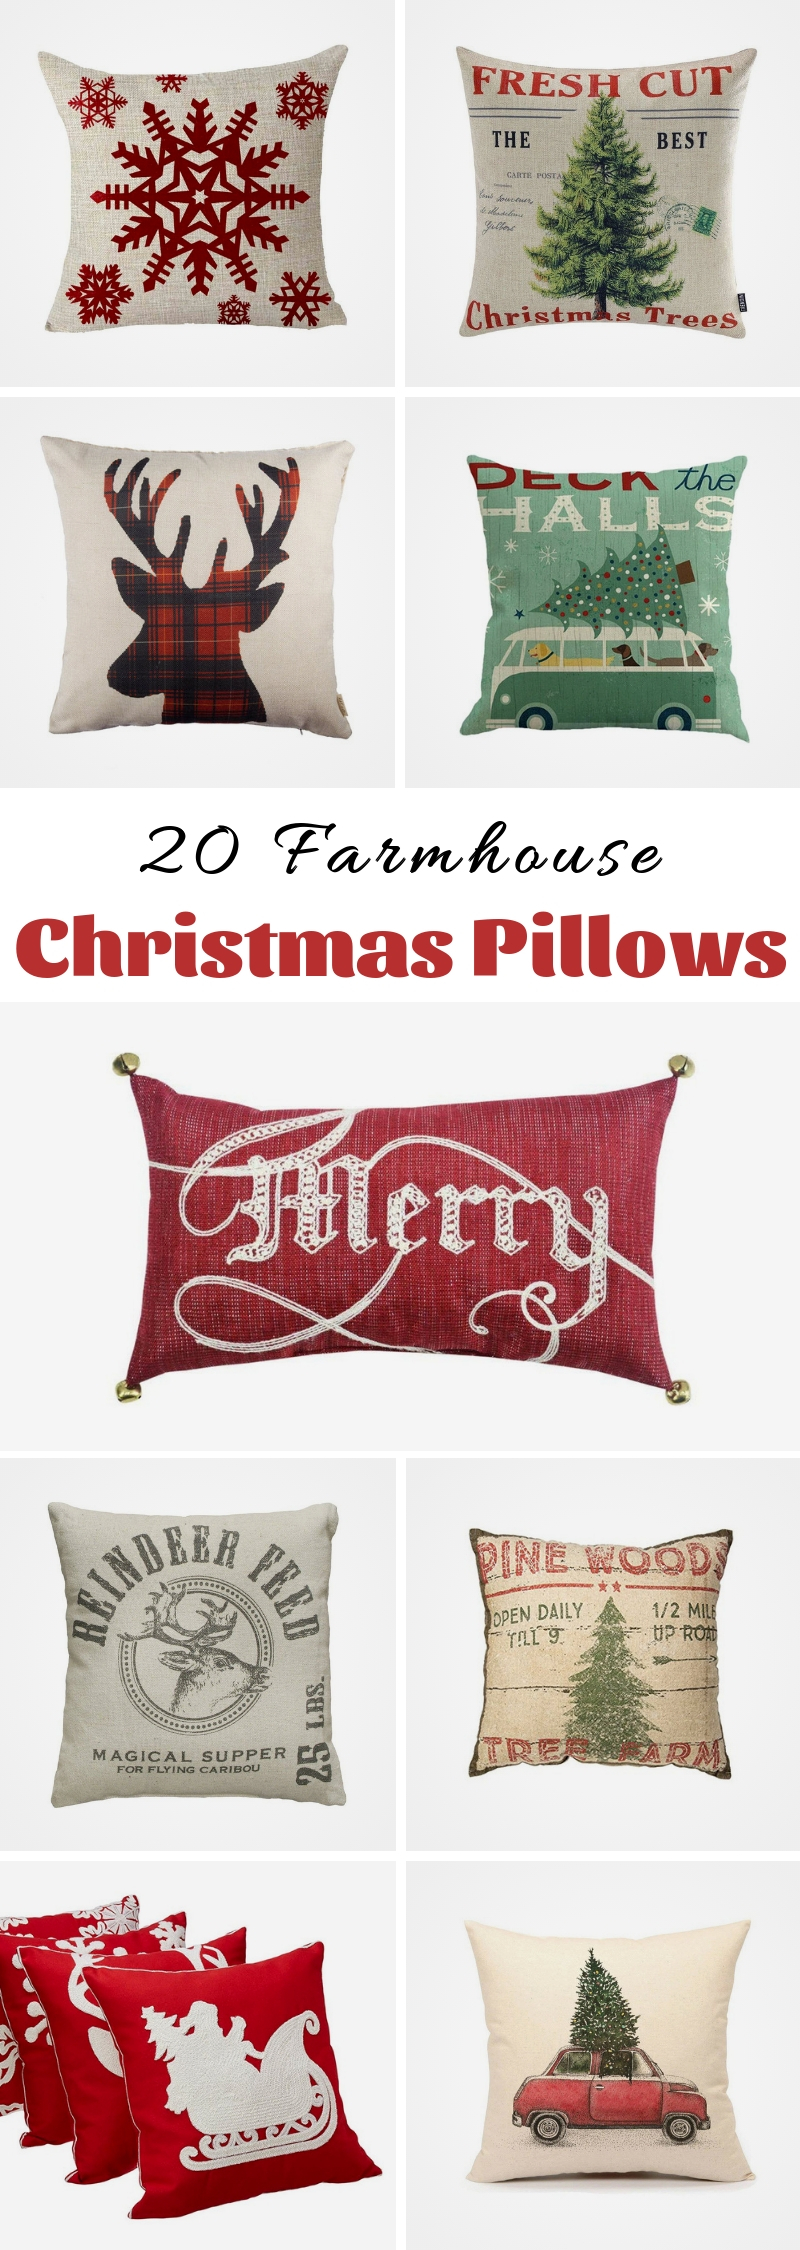 20 Farmhouse Christmas Pillows